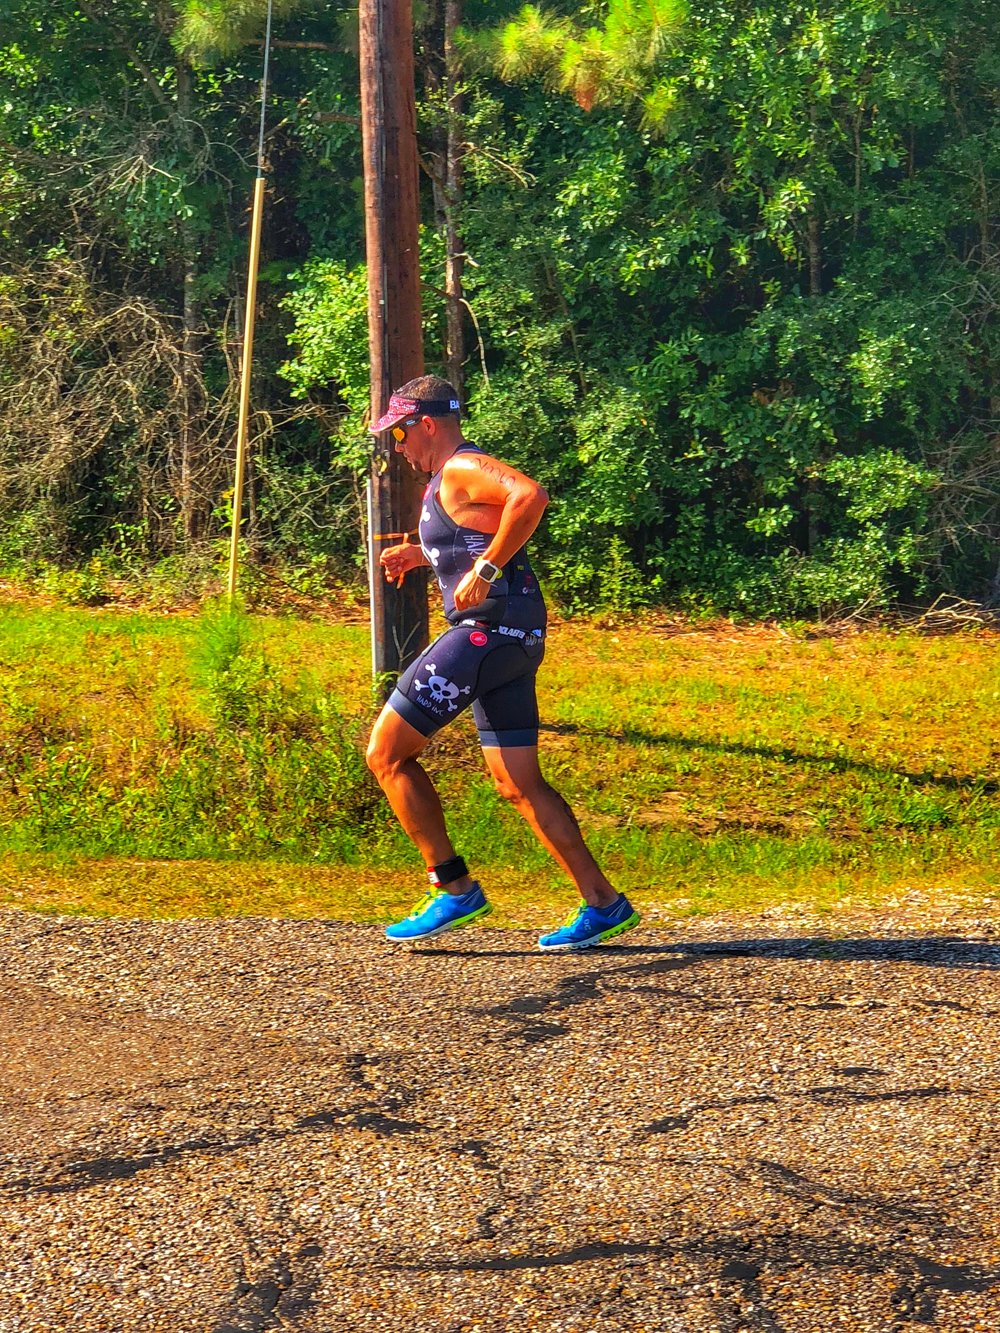 Coach_Terry_Wilson_Craig_Clark_Ironman_Gulf_Coast_70.3_Run.JPG